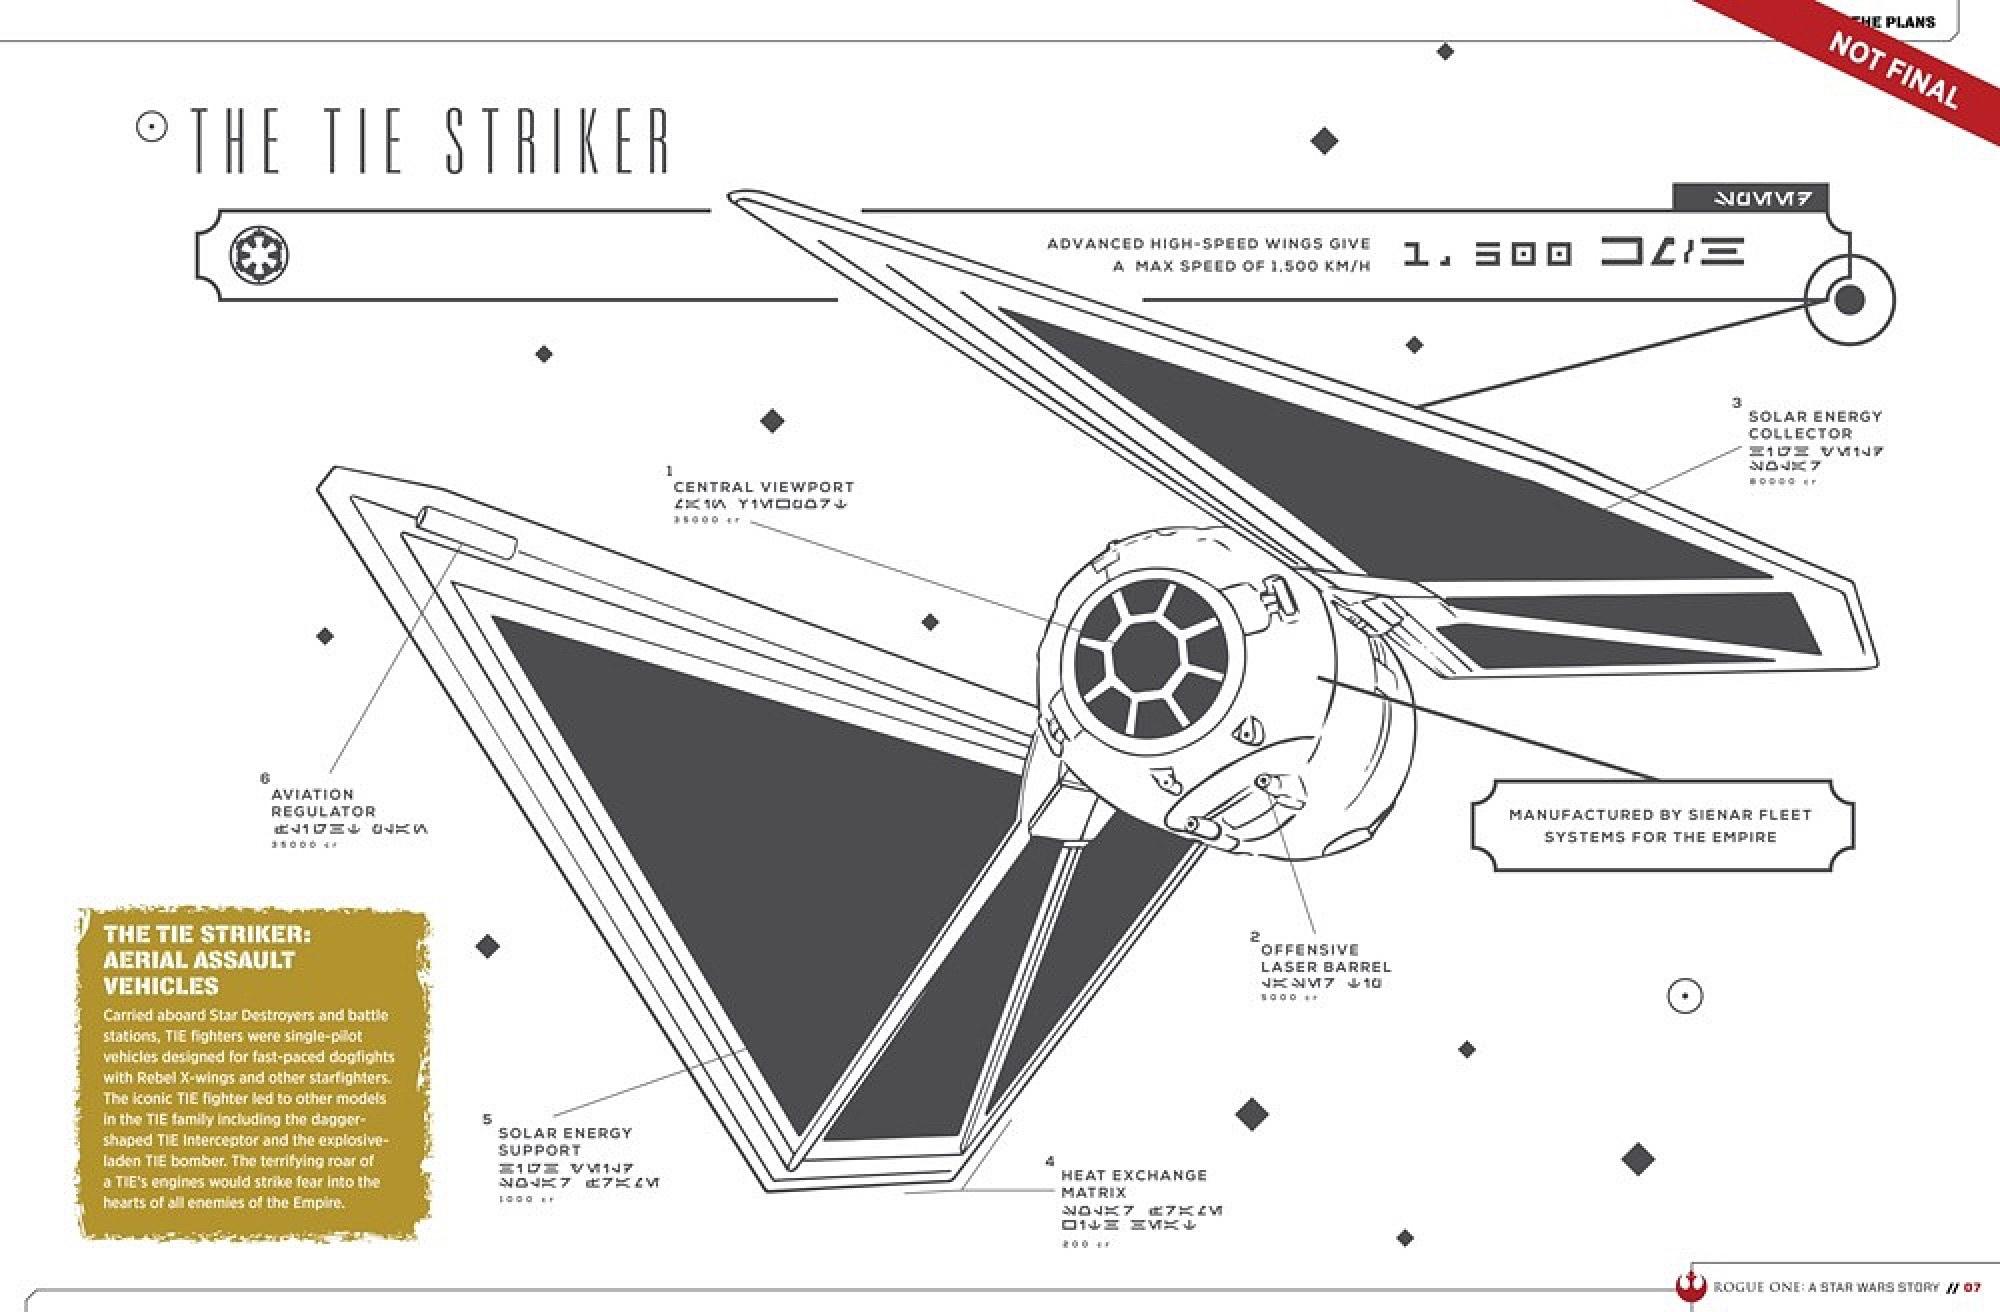 star wars rogue one visual guide pdf